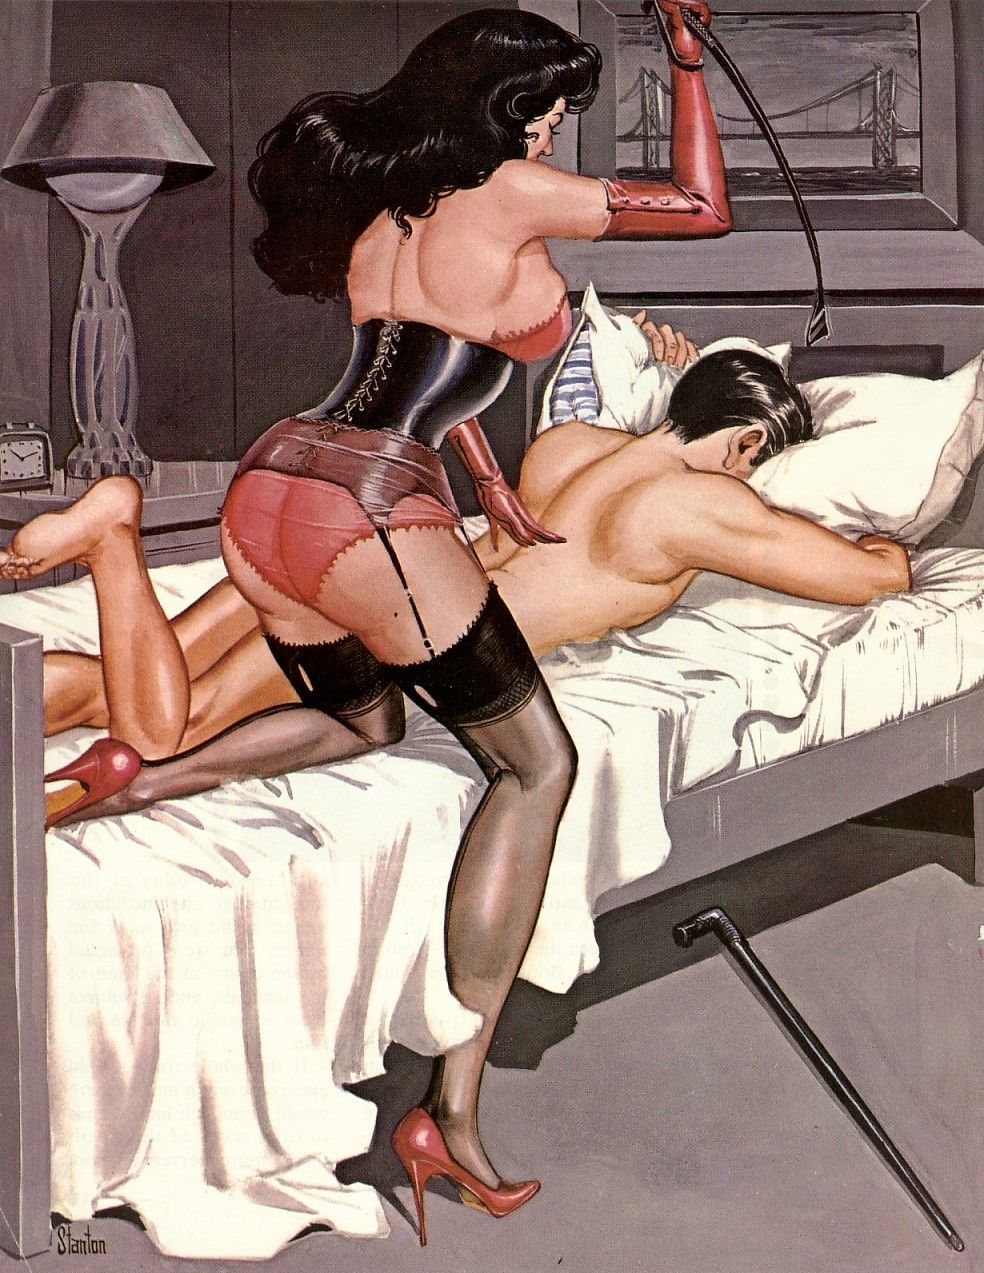 best-sexy-edging-tie-tease-orgasm-cock-play-london-kings-cross-hot-model-mistress.jpg